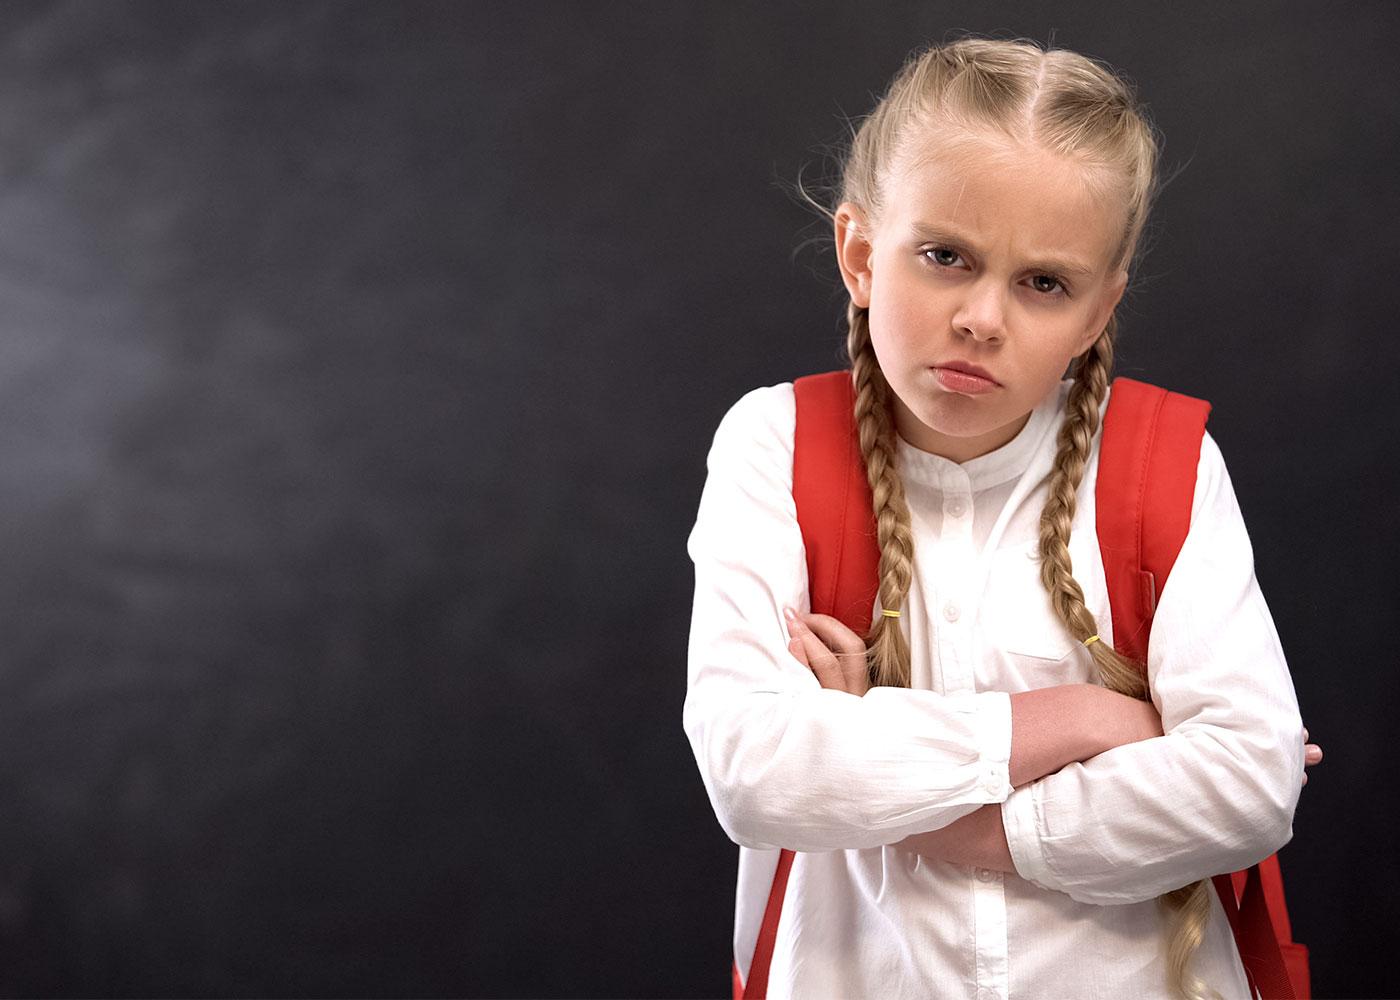 Annoyed schoolgirl with crossed hands